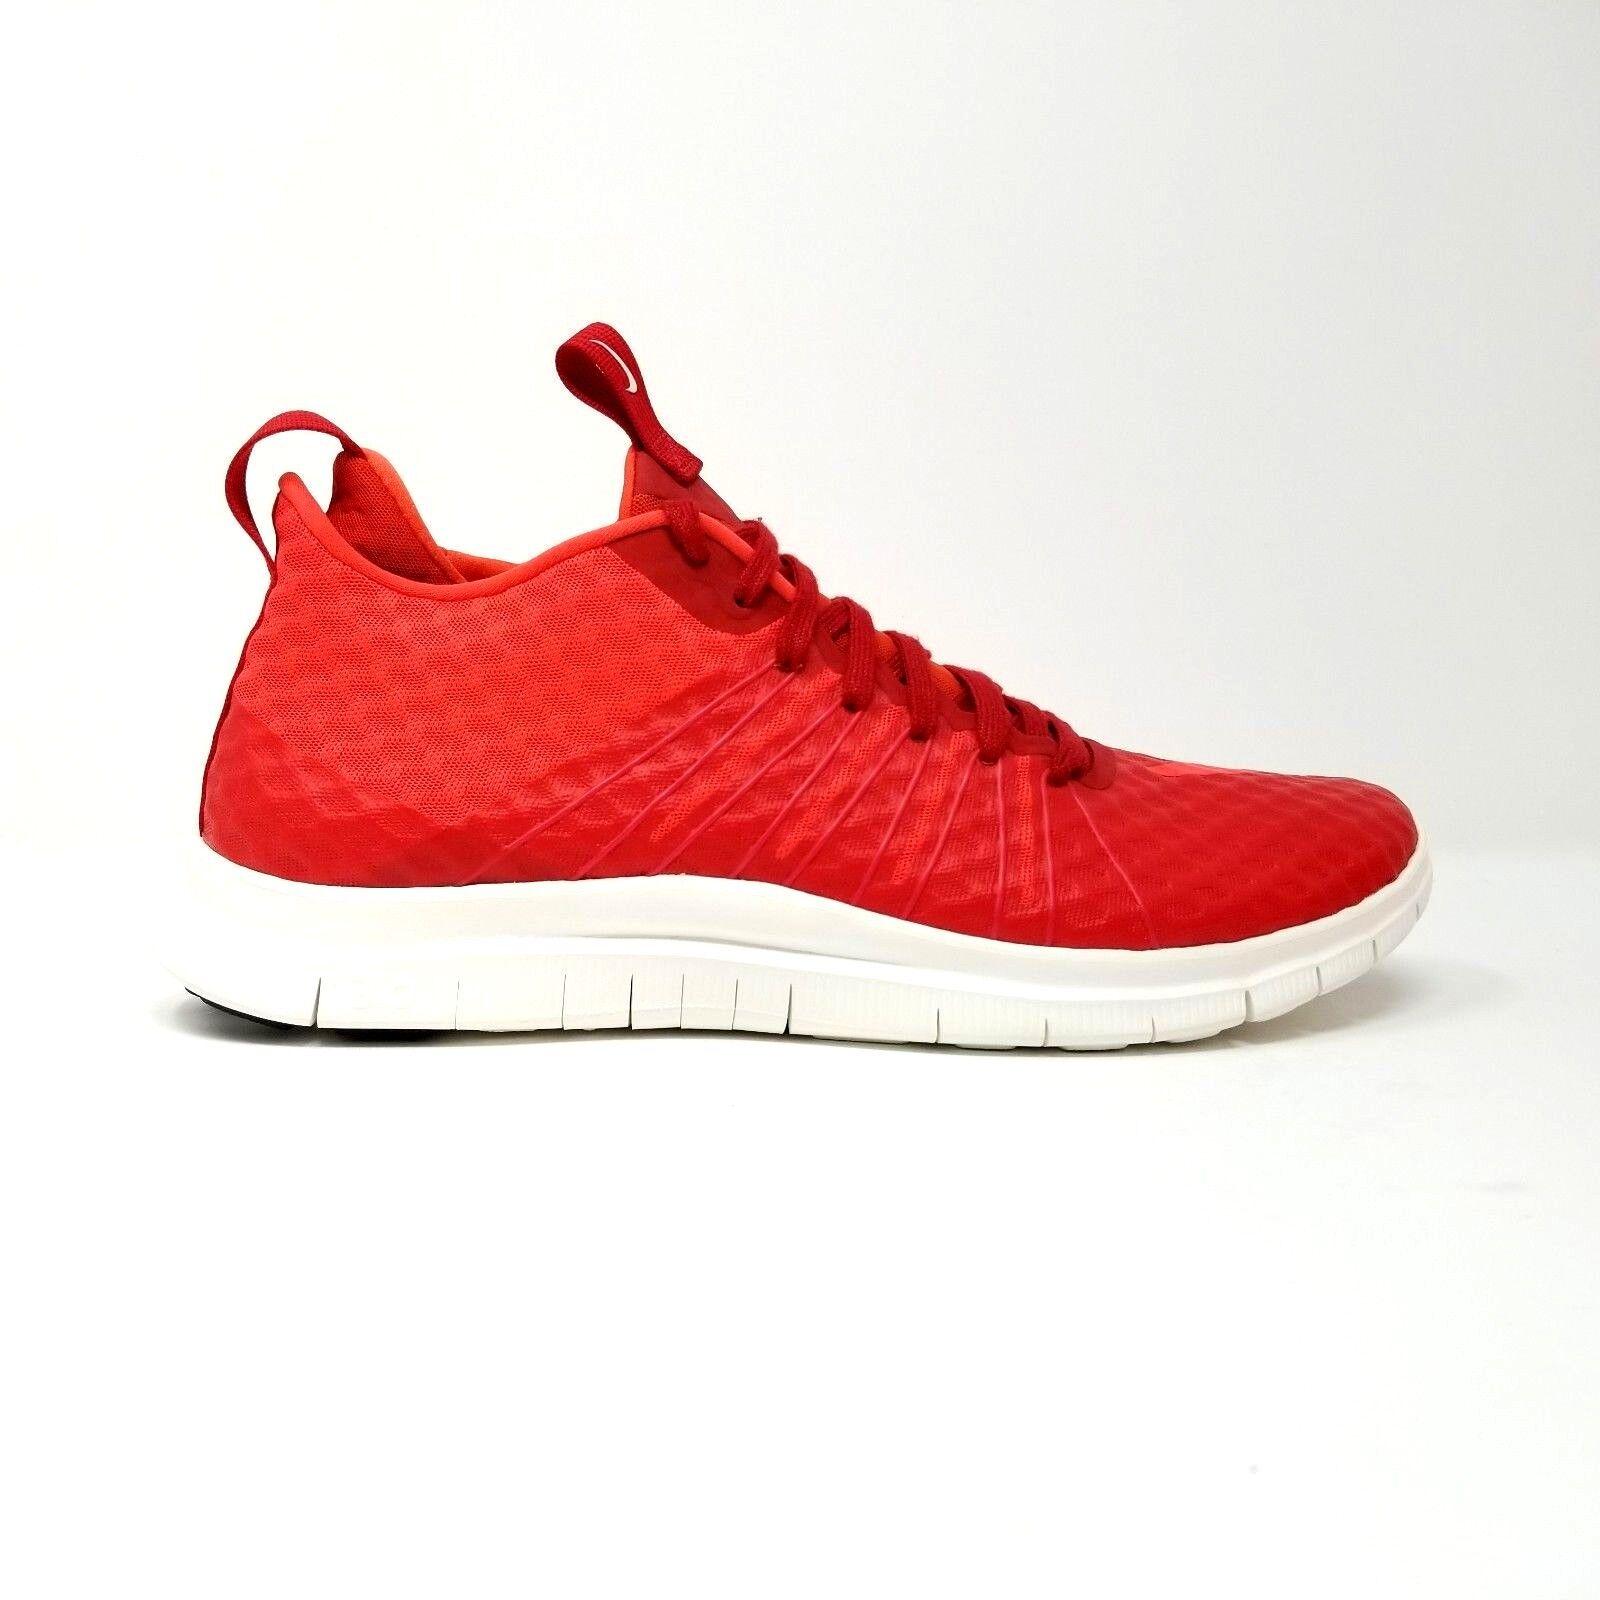 Nike uomini palestra liberi hypervenom 2 fs palestra uomini rosso cremisi avorio taglia 12 805890 600 87bfb6